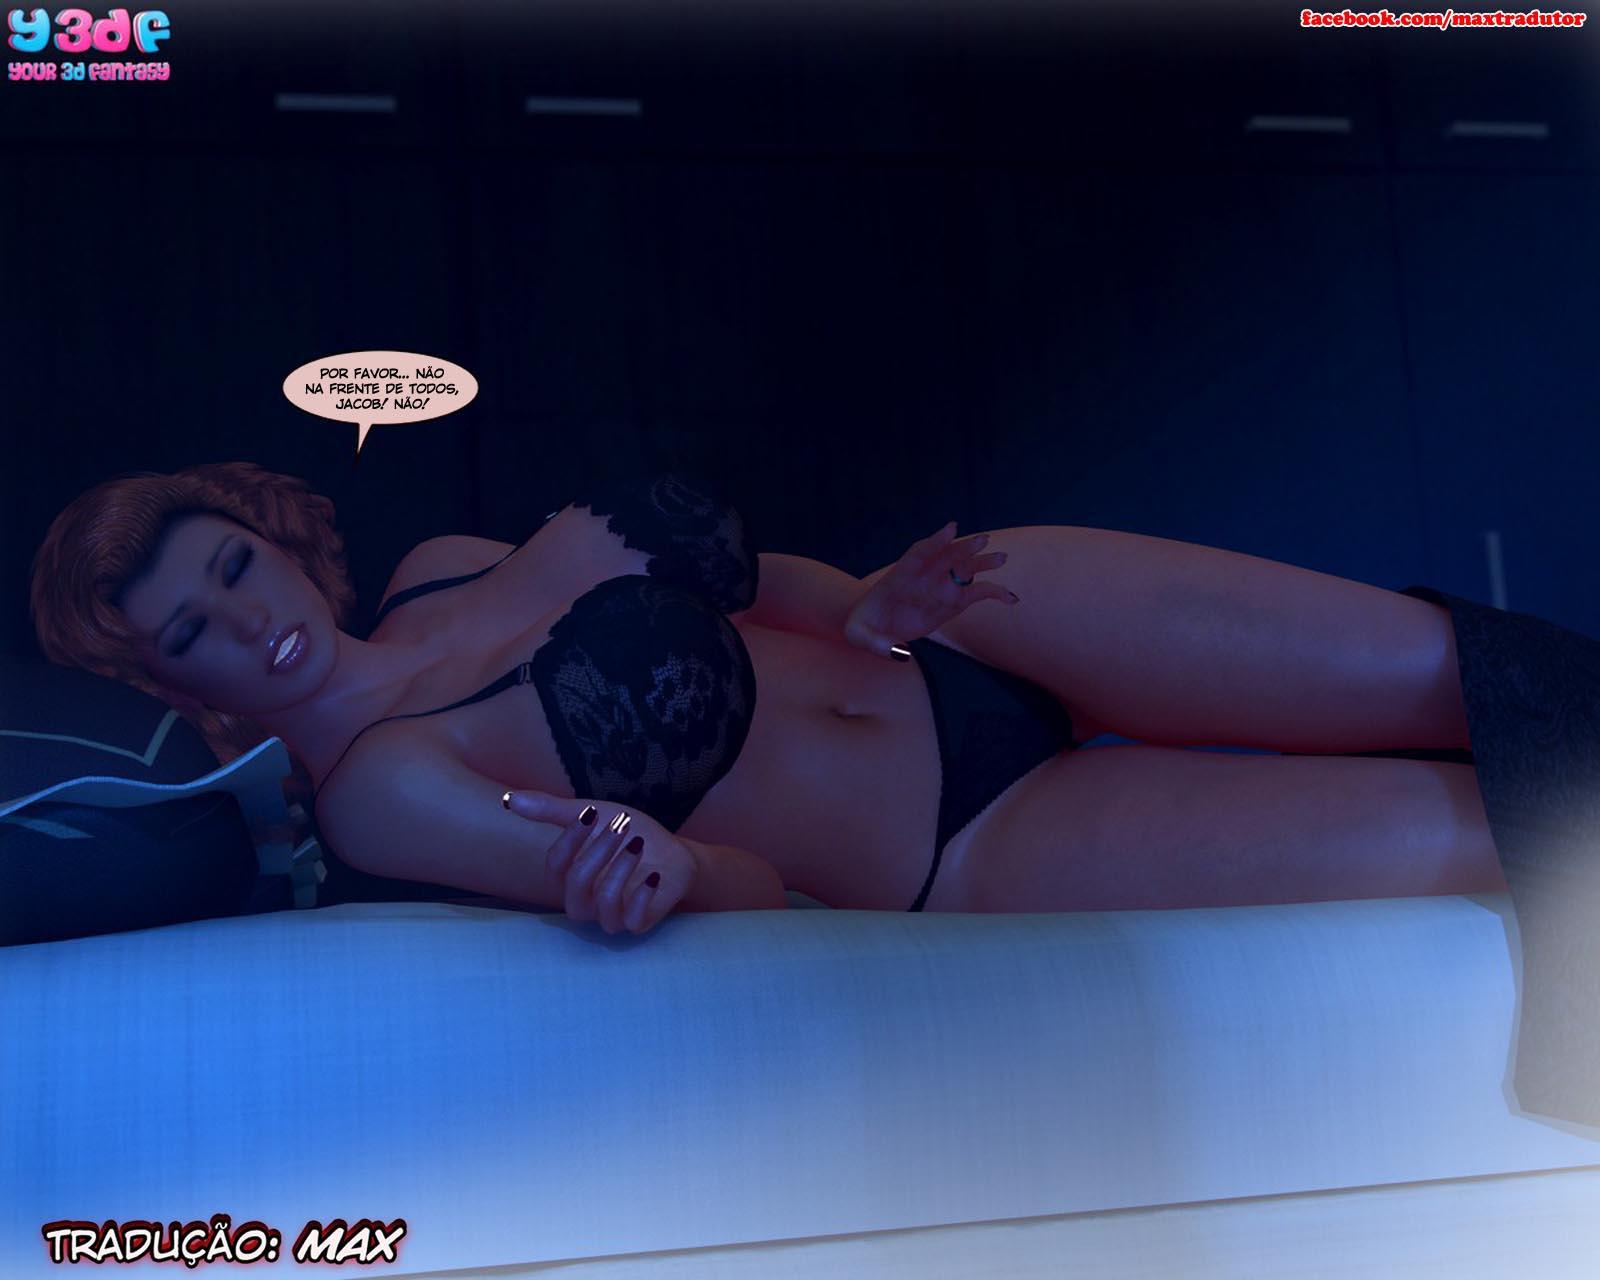 About Time - Hentai Porno 3D